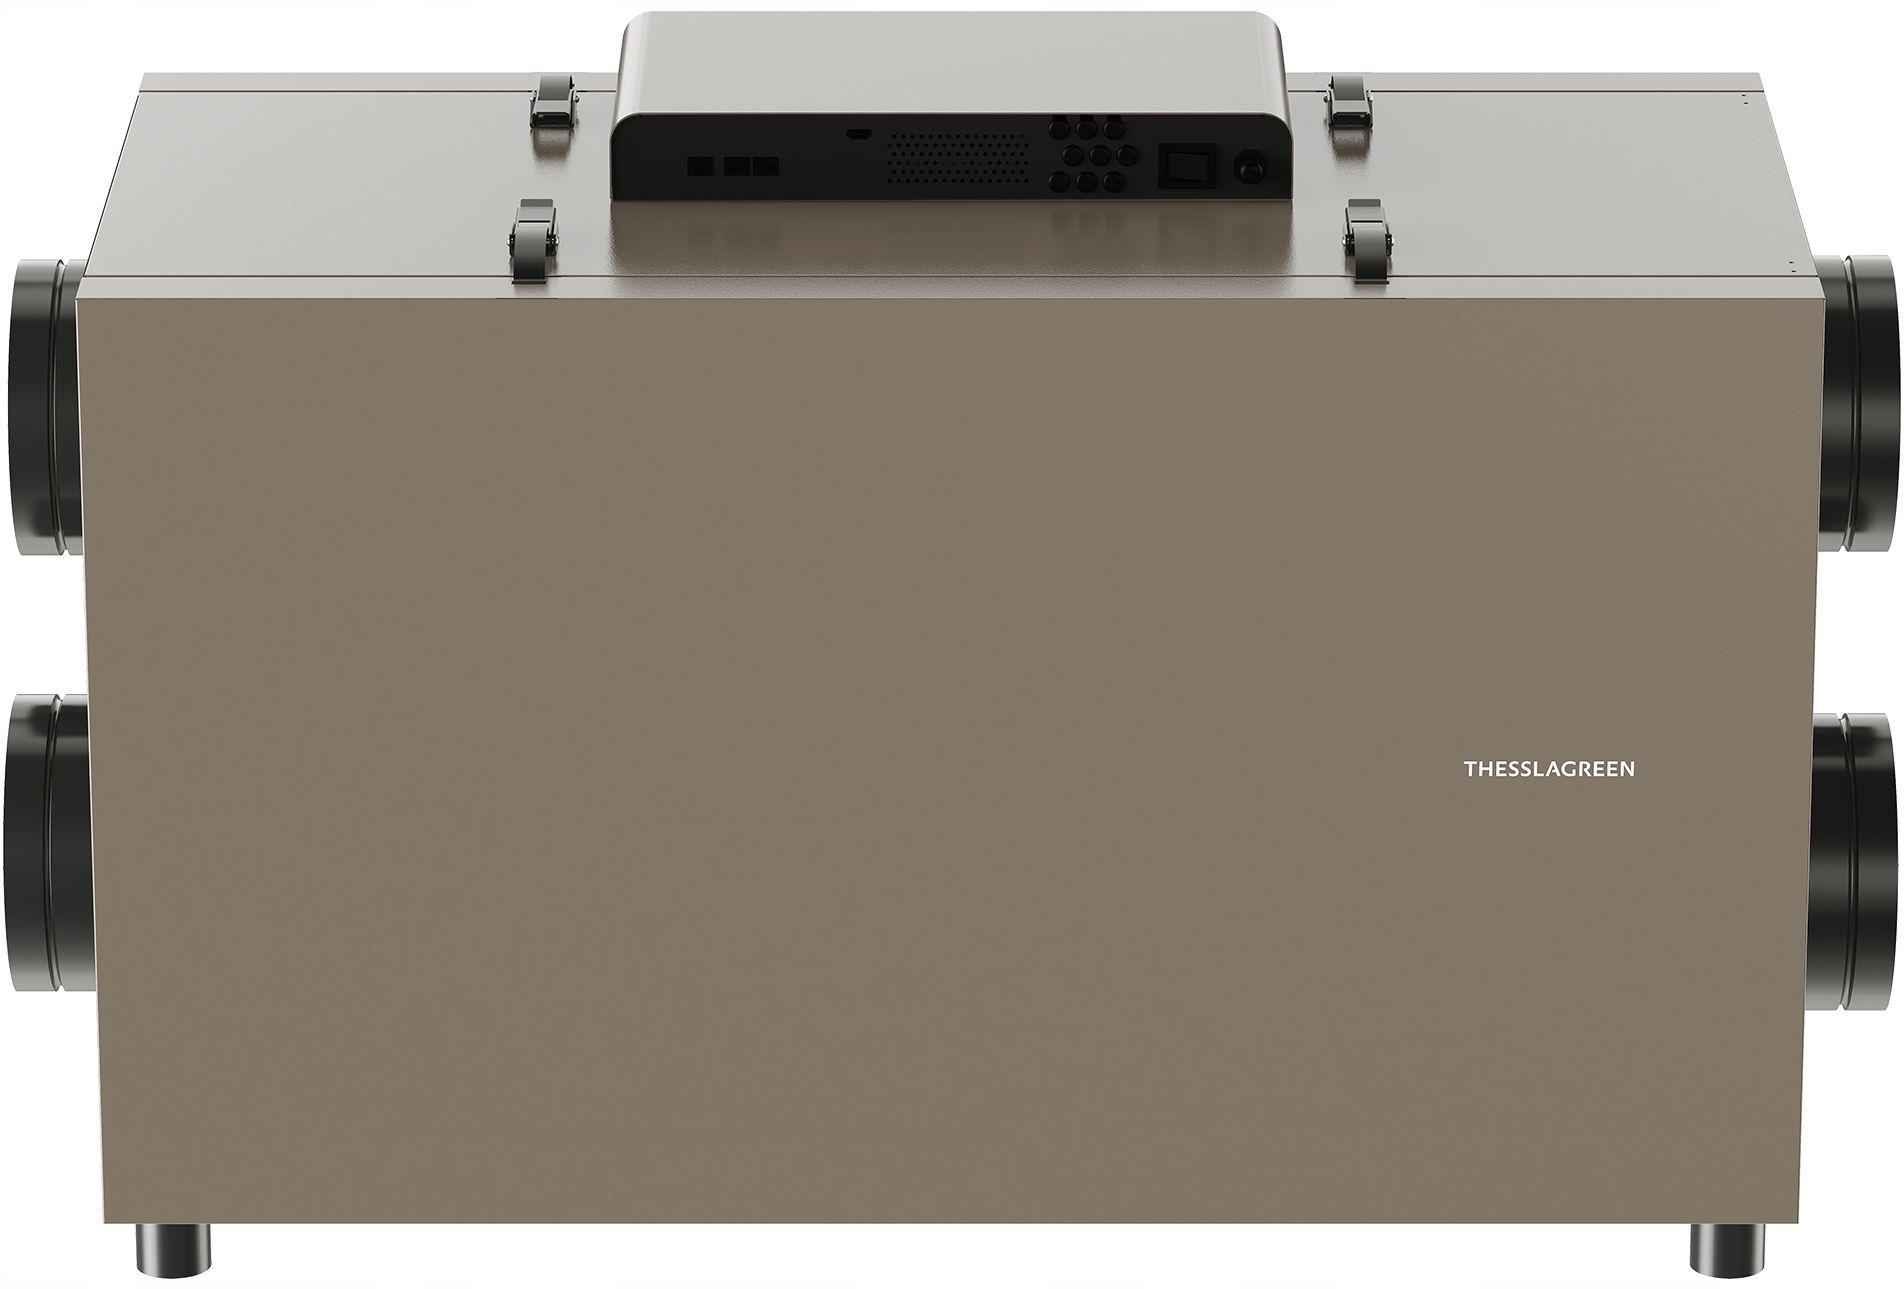 Rekuperator Thesslagreen AirPack Home 400h Energy+ Centrala rekuperacyjna Tesla Airpack Home 400h Energy+ z modułem CF